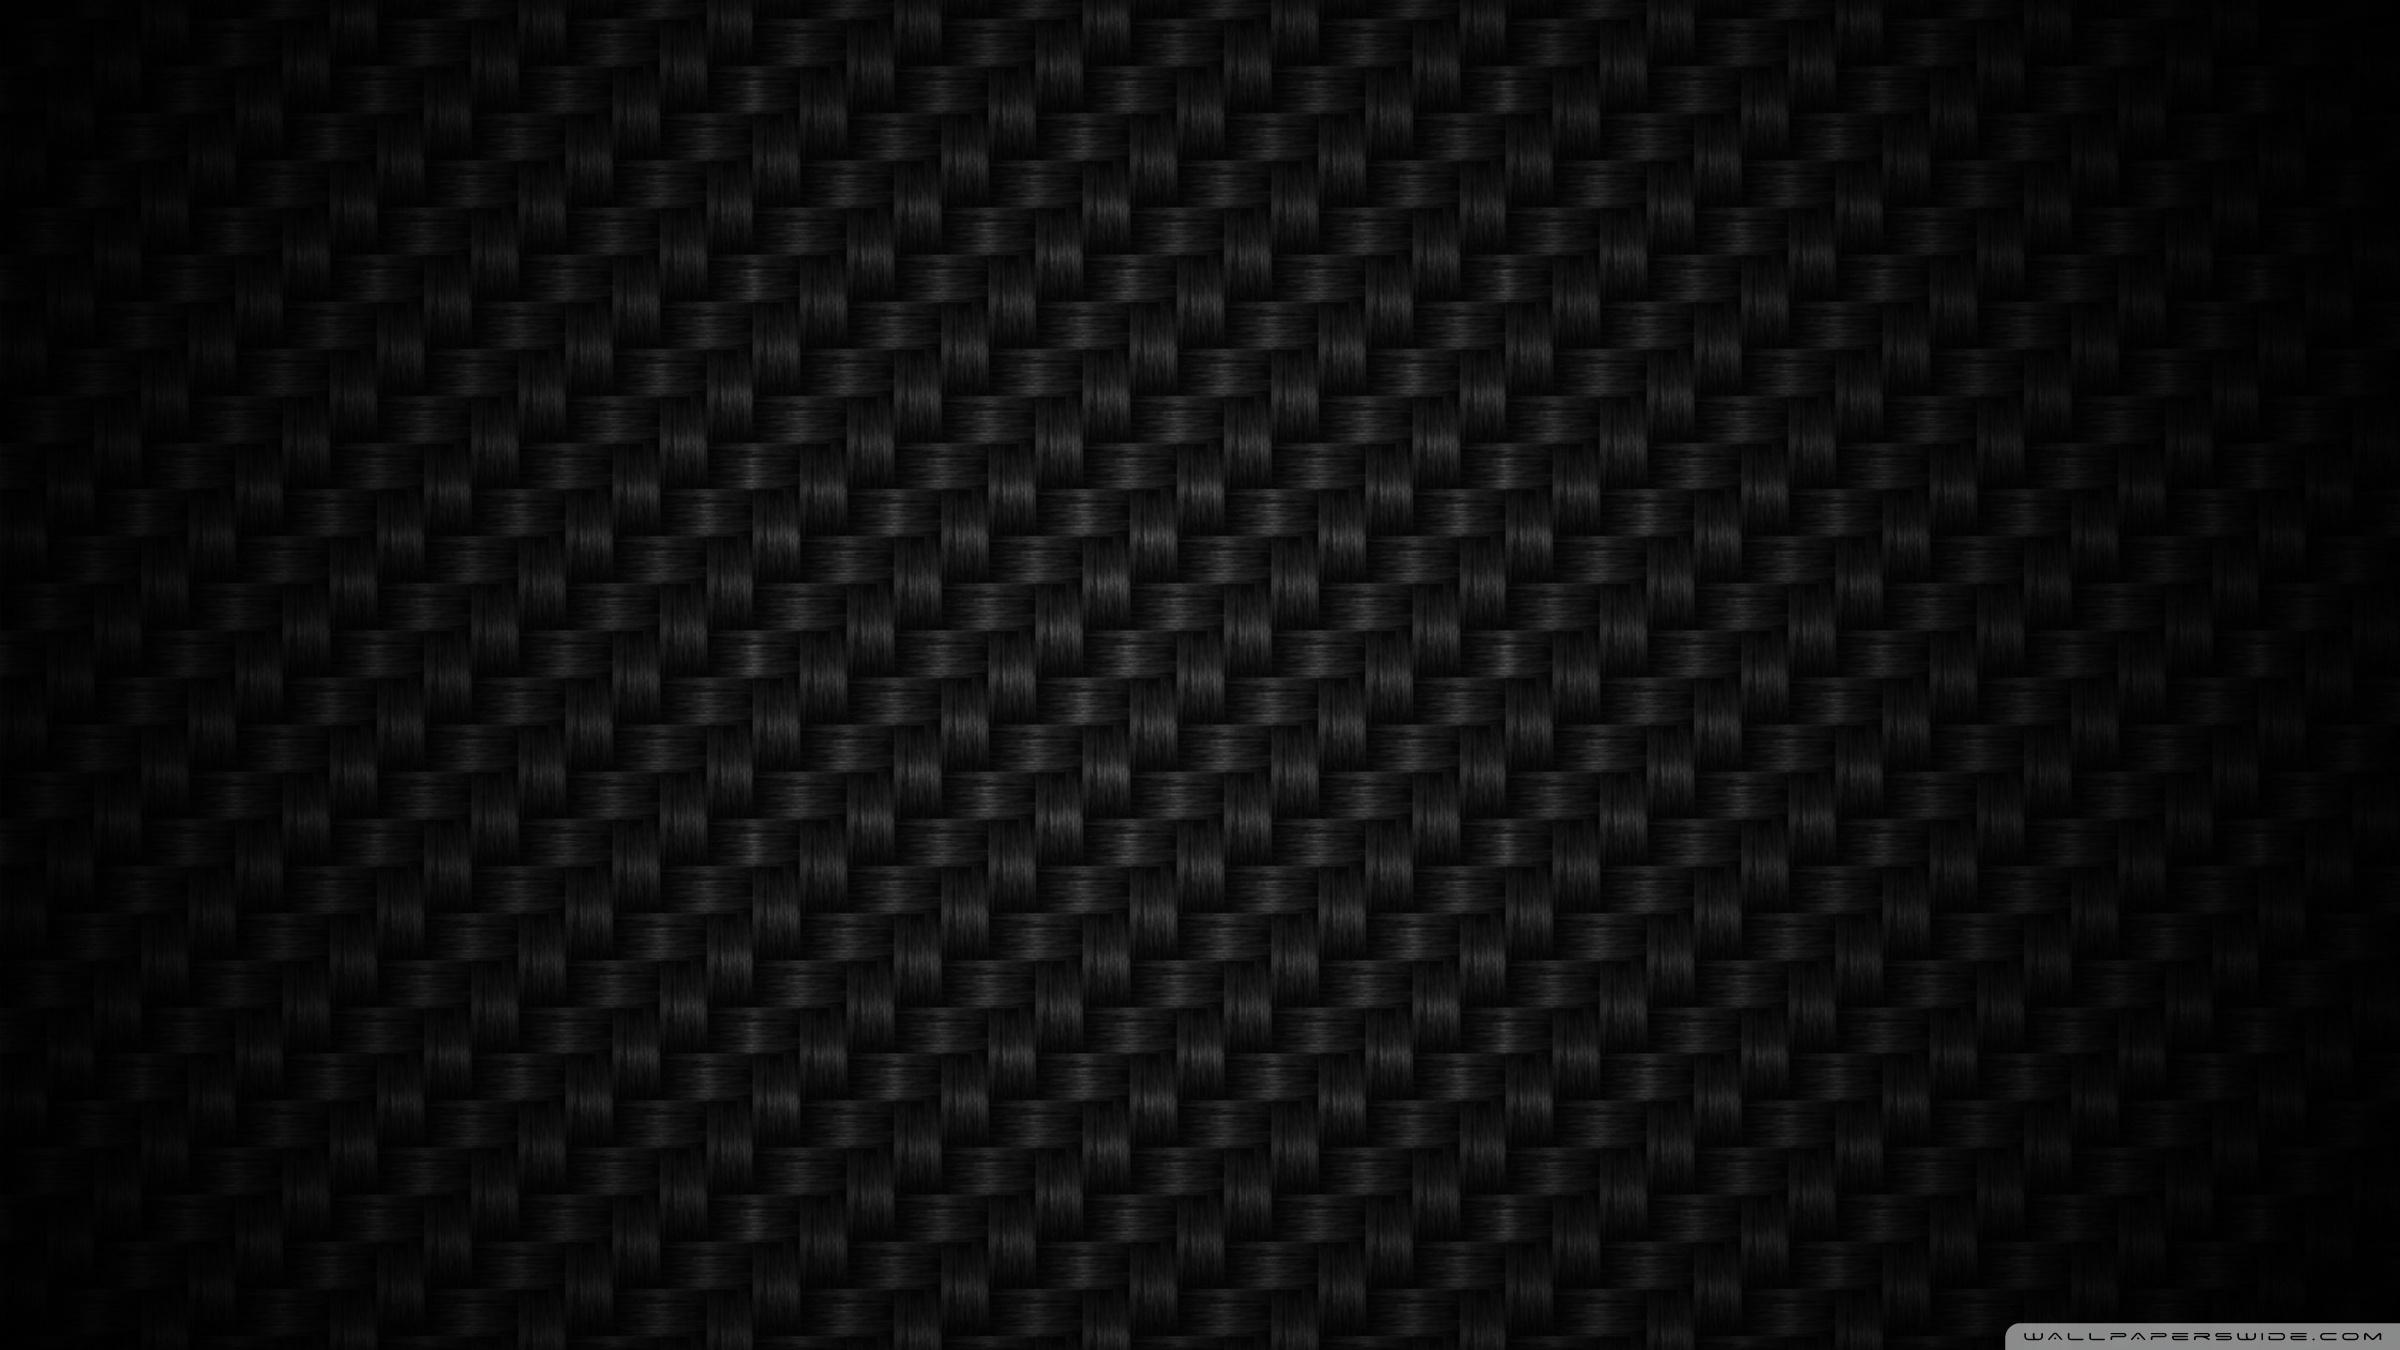 Black Pattern 4K HD Desktop Wallpaper for Dual Monitor Desktops 2400x1350